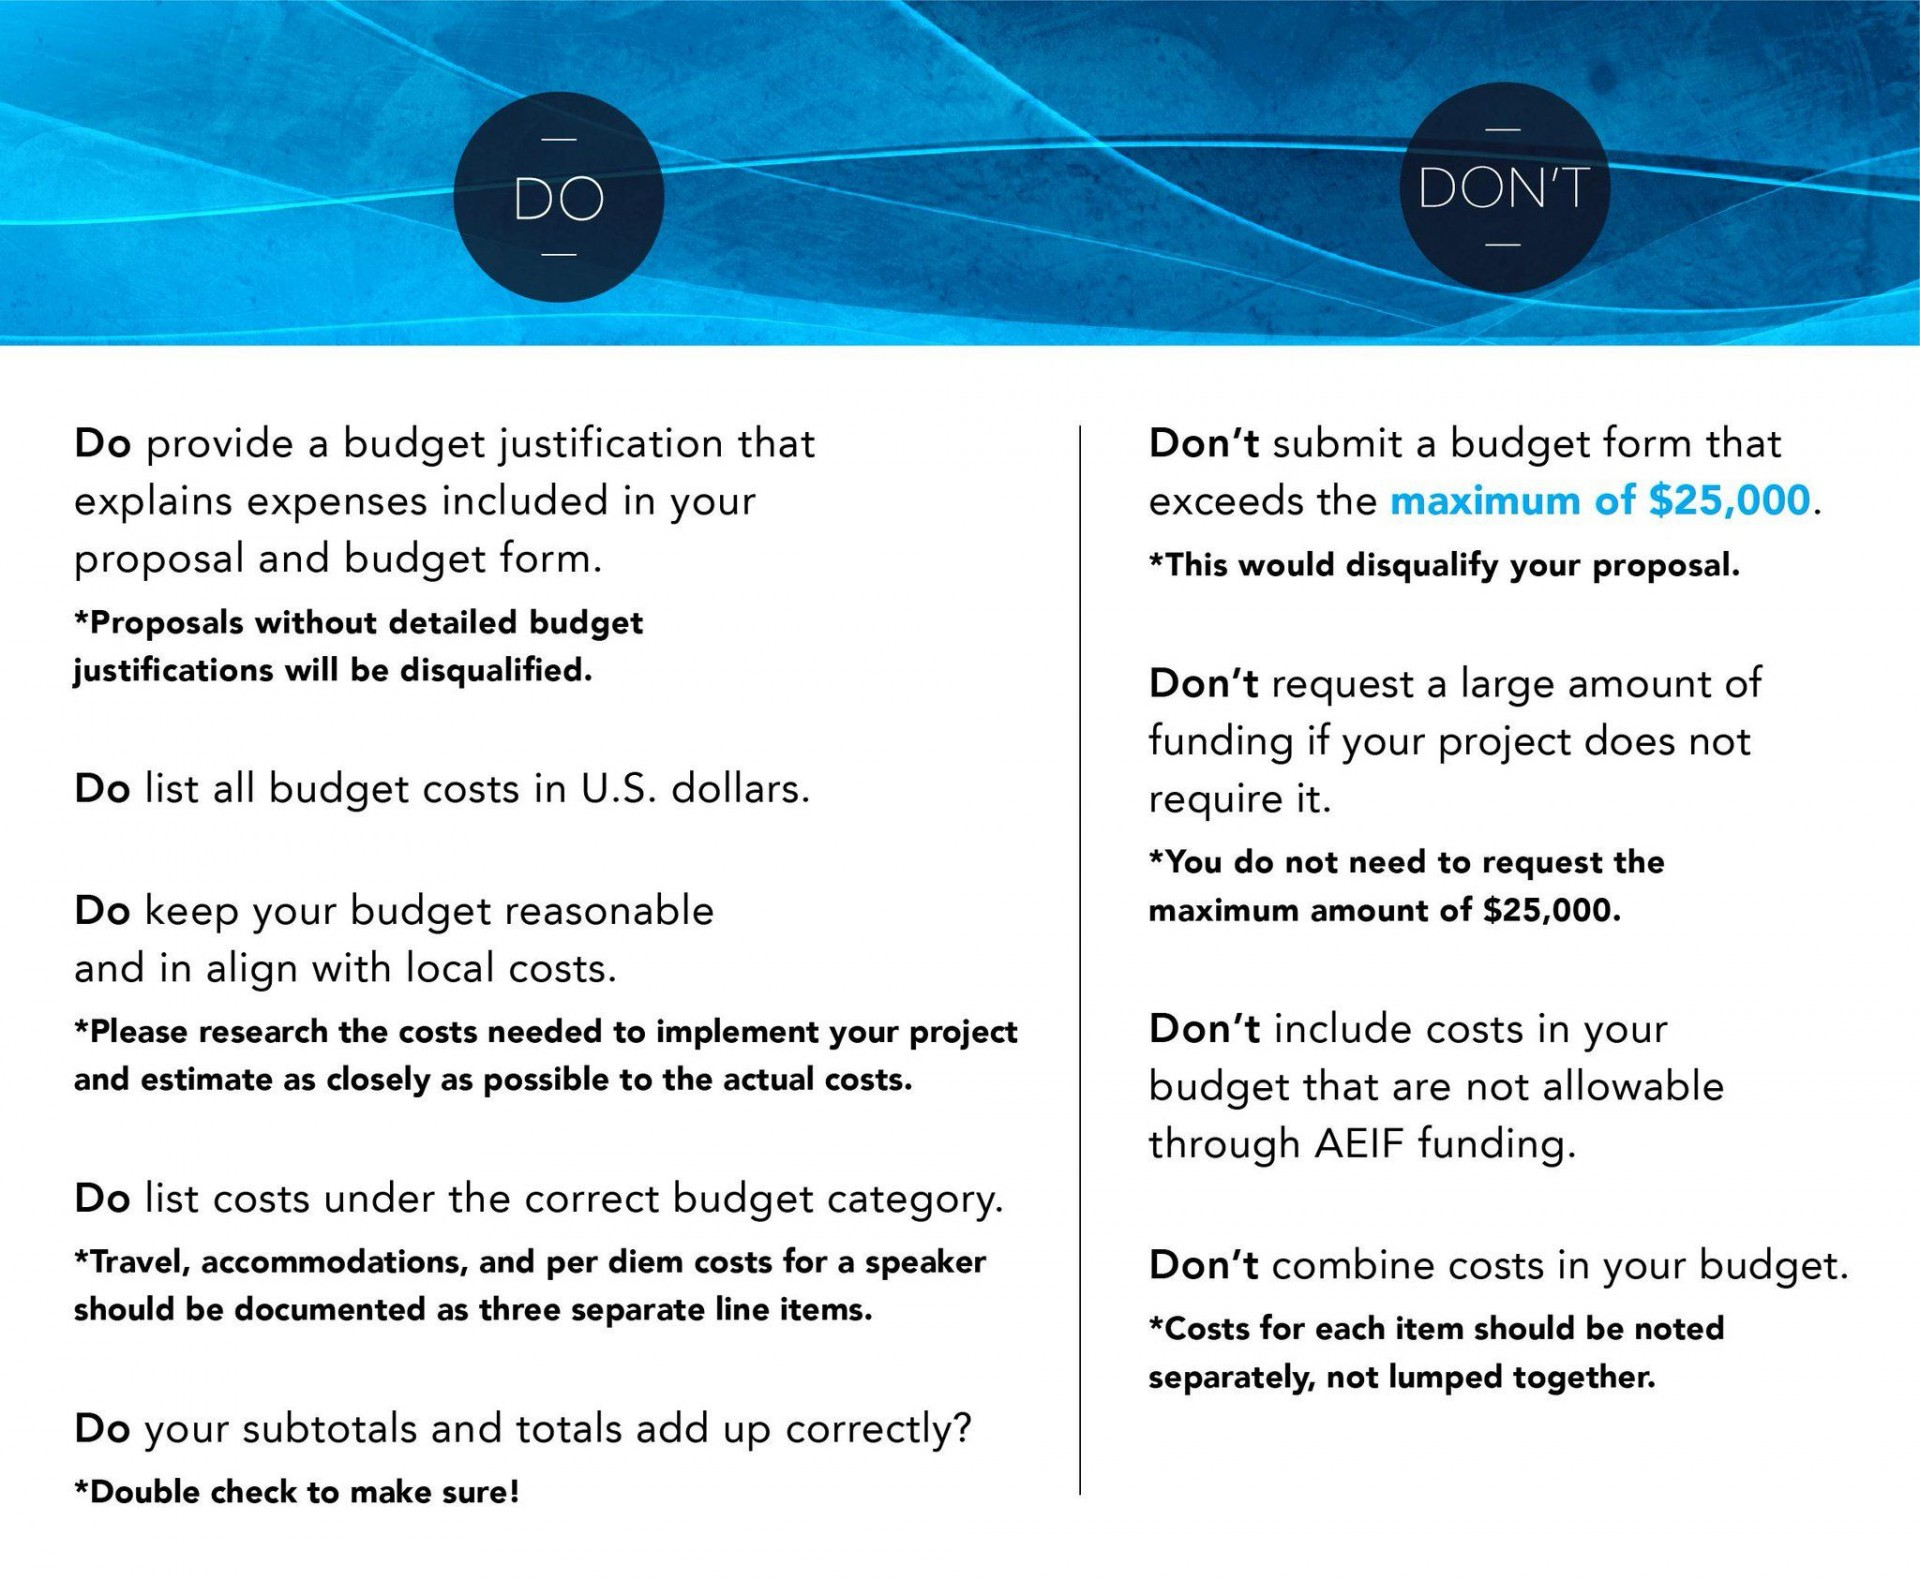 004 Unforgettable Line Item Budget Form Inspiration  Sample Template Spreadsheet Format1920